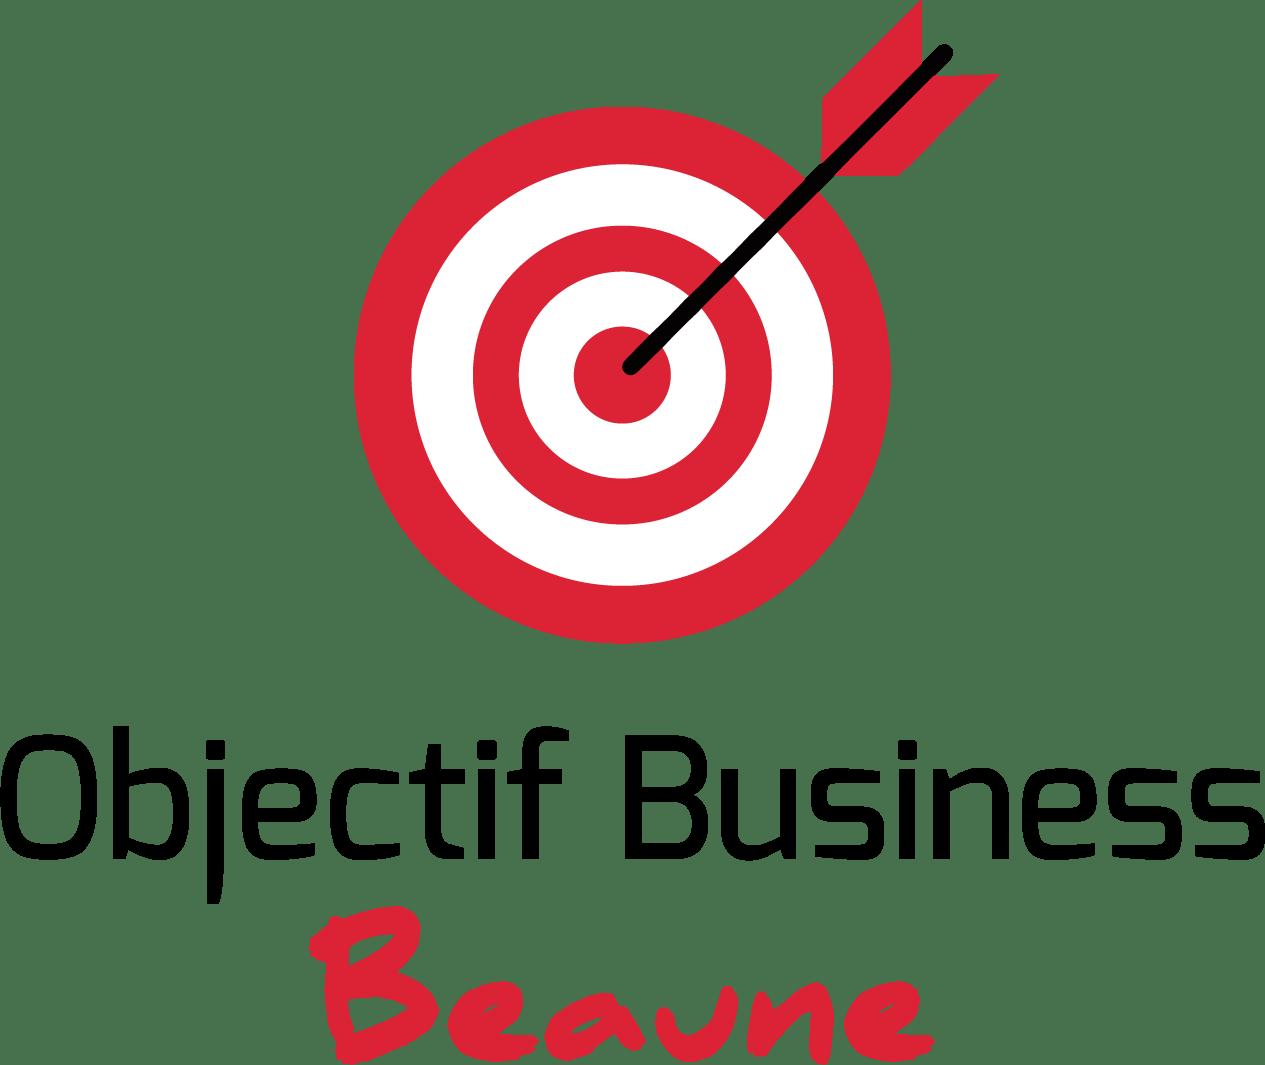 Objectif Business Beaune